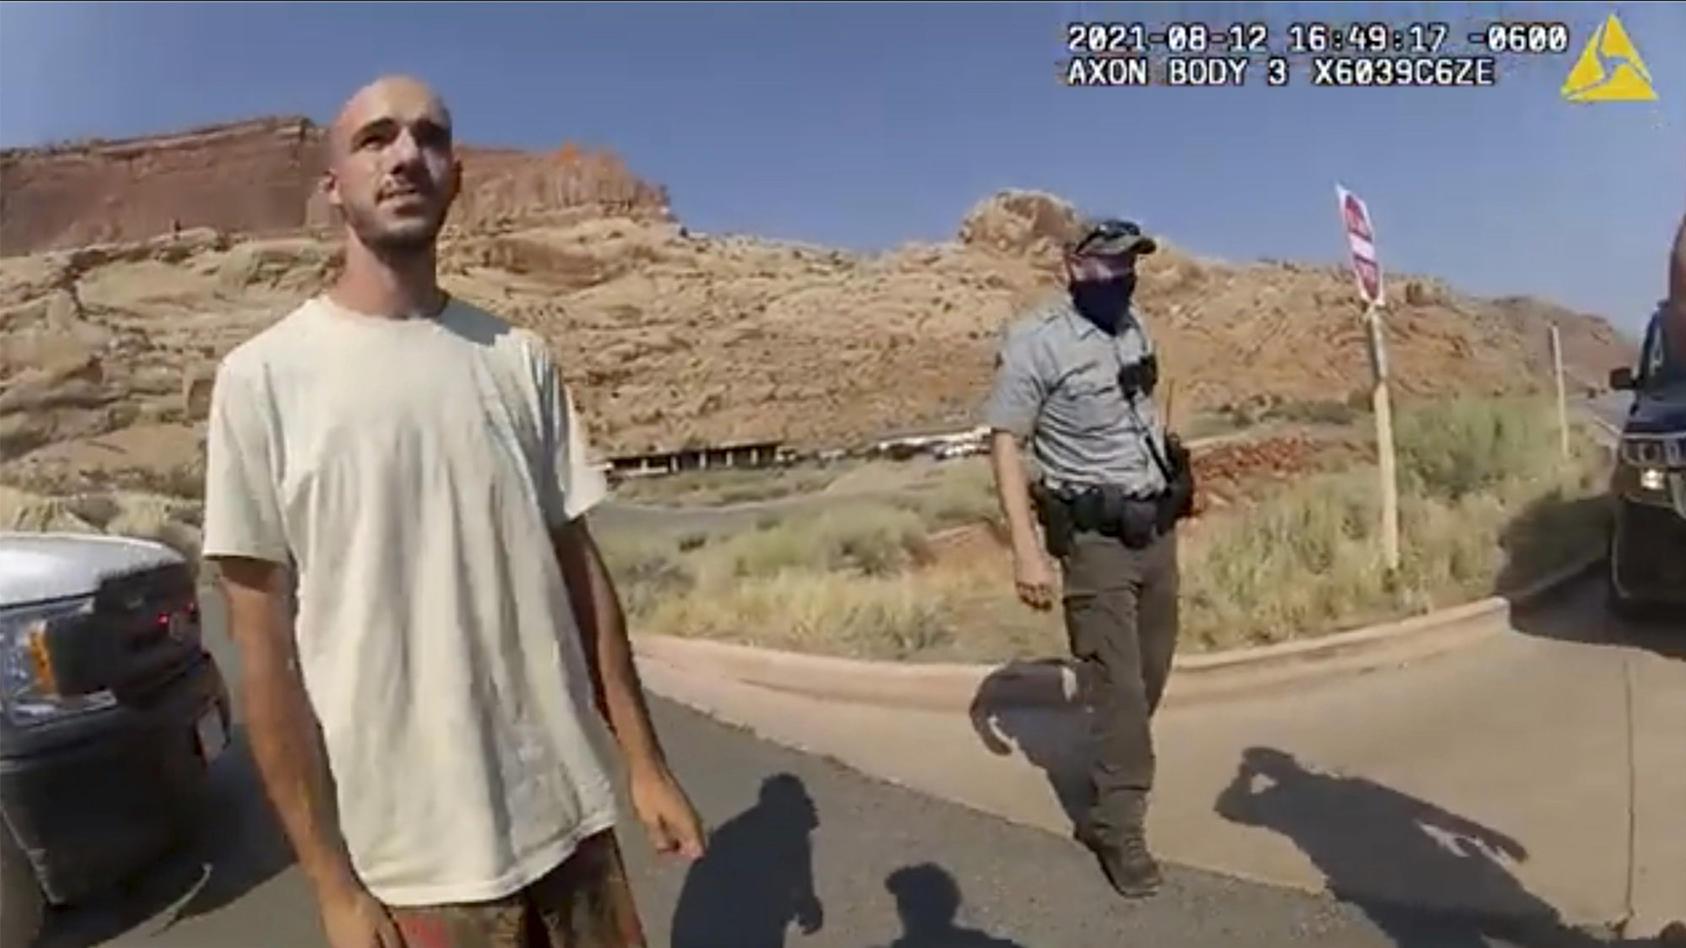 Fall Gabby Petito - Brian Laundrie tot? Polizei findet menschliche Überreste